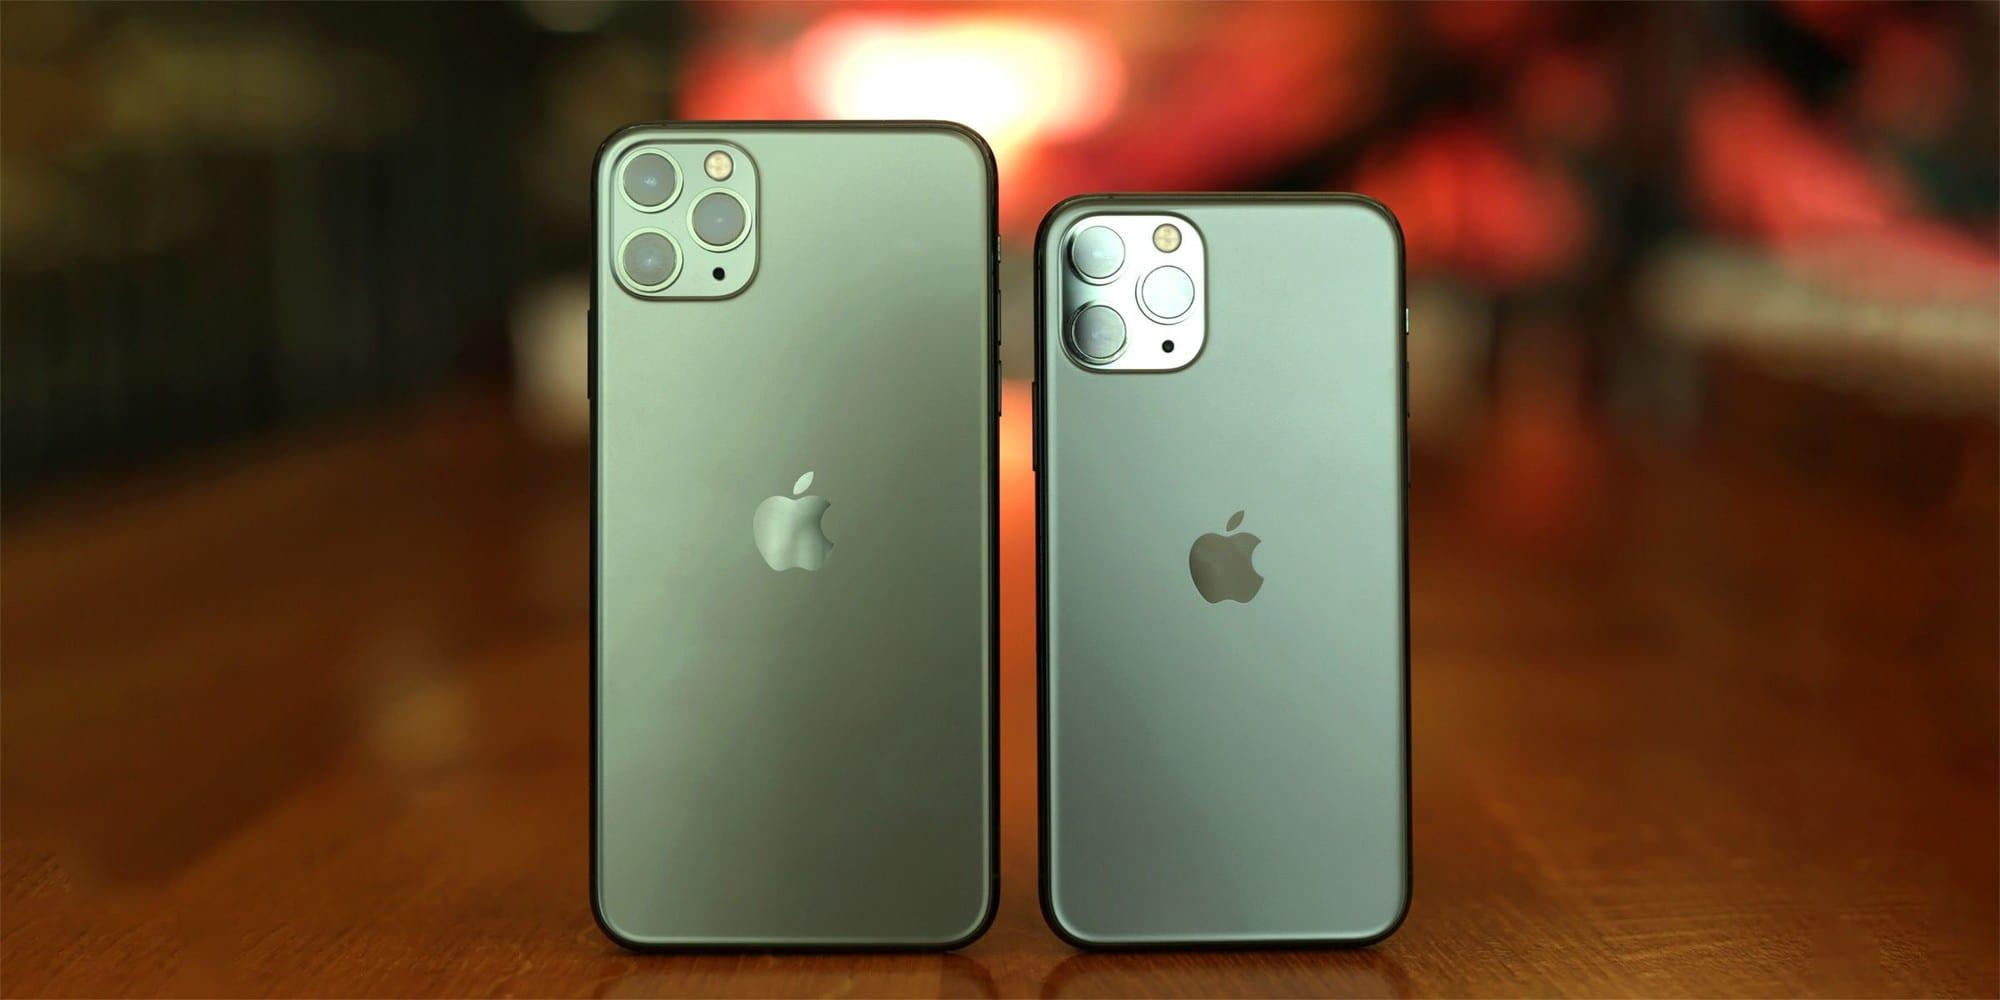 جوال iphone 11 pro max